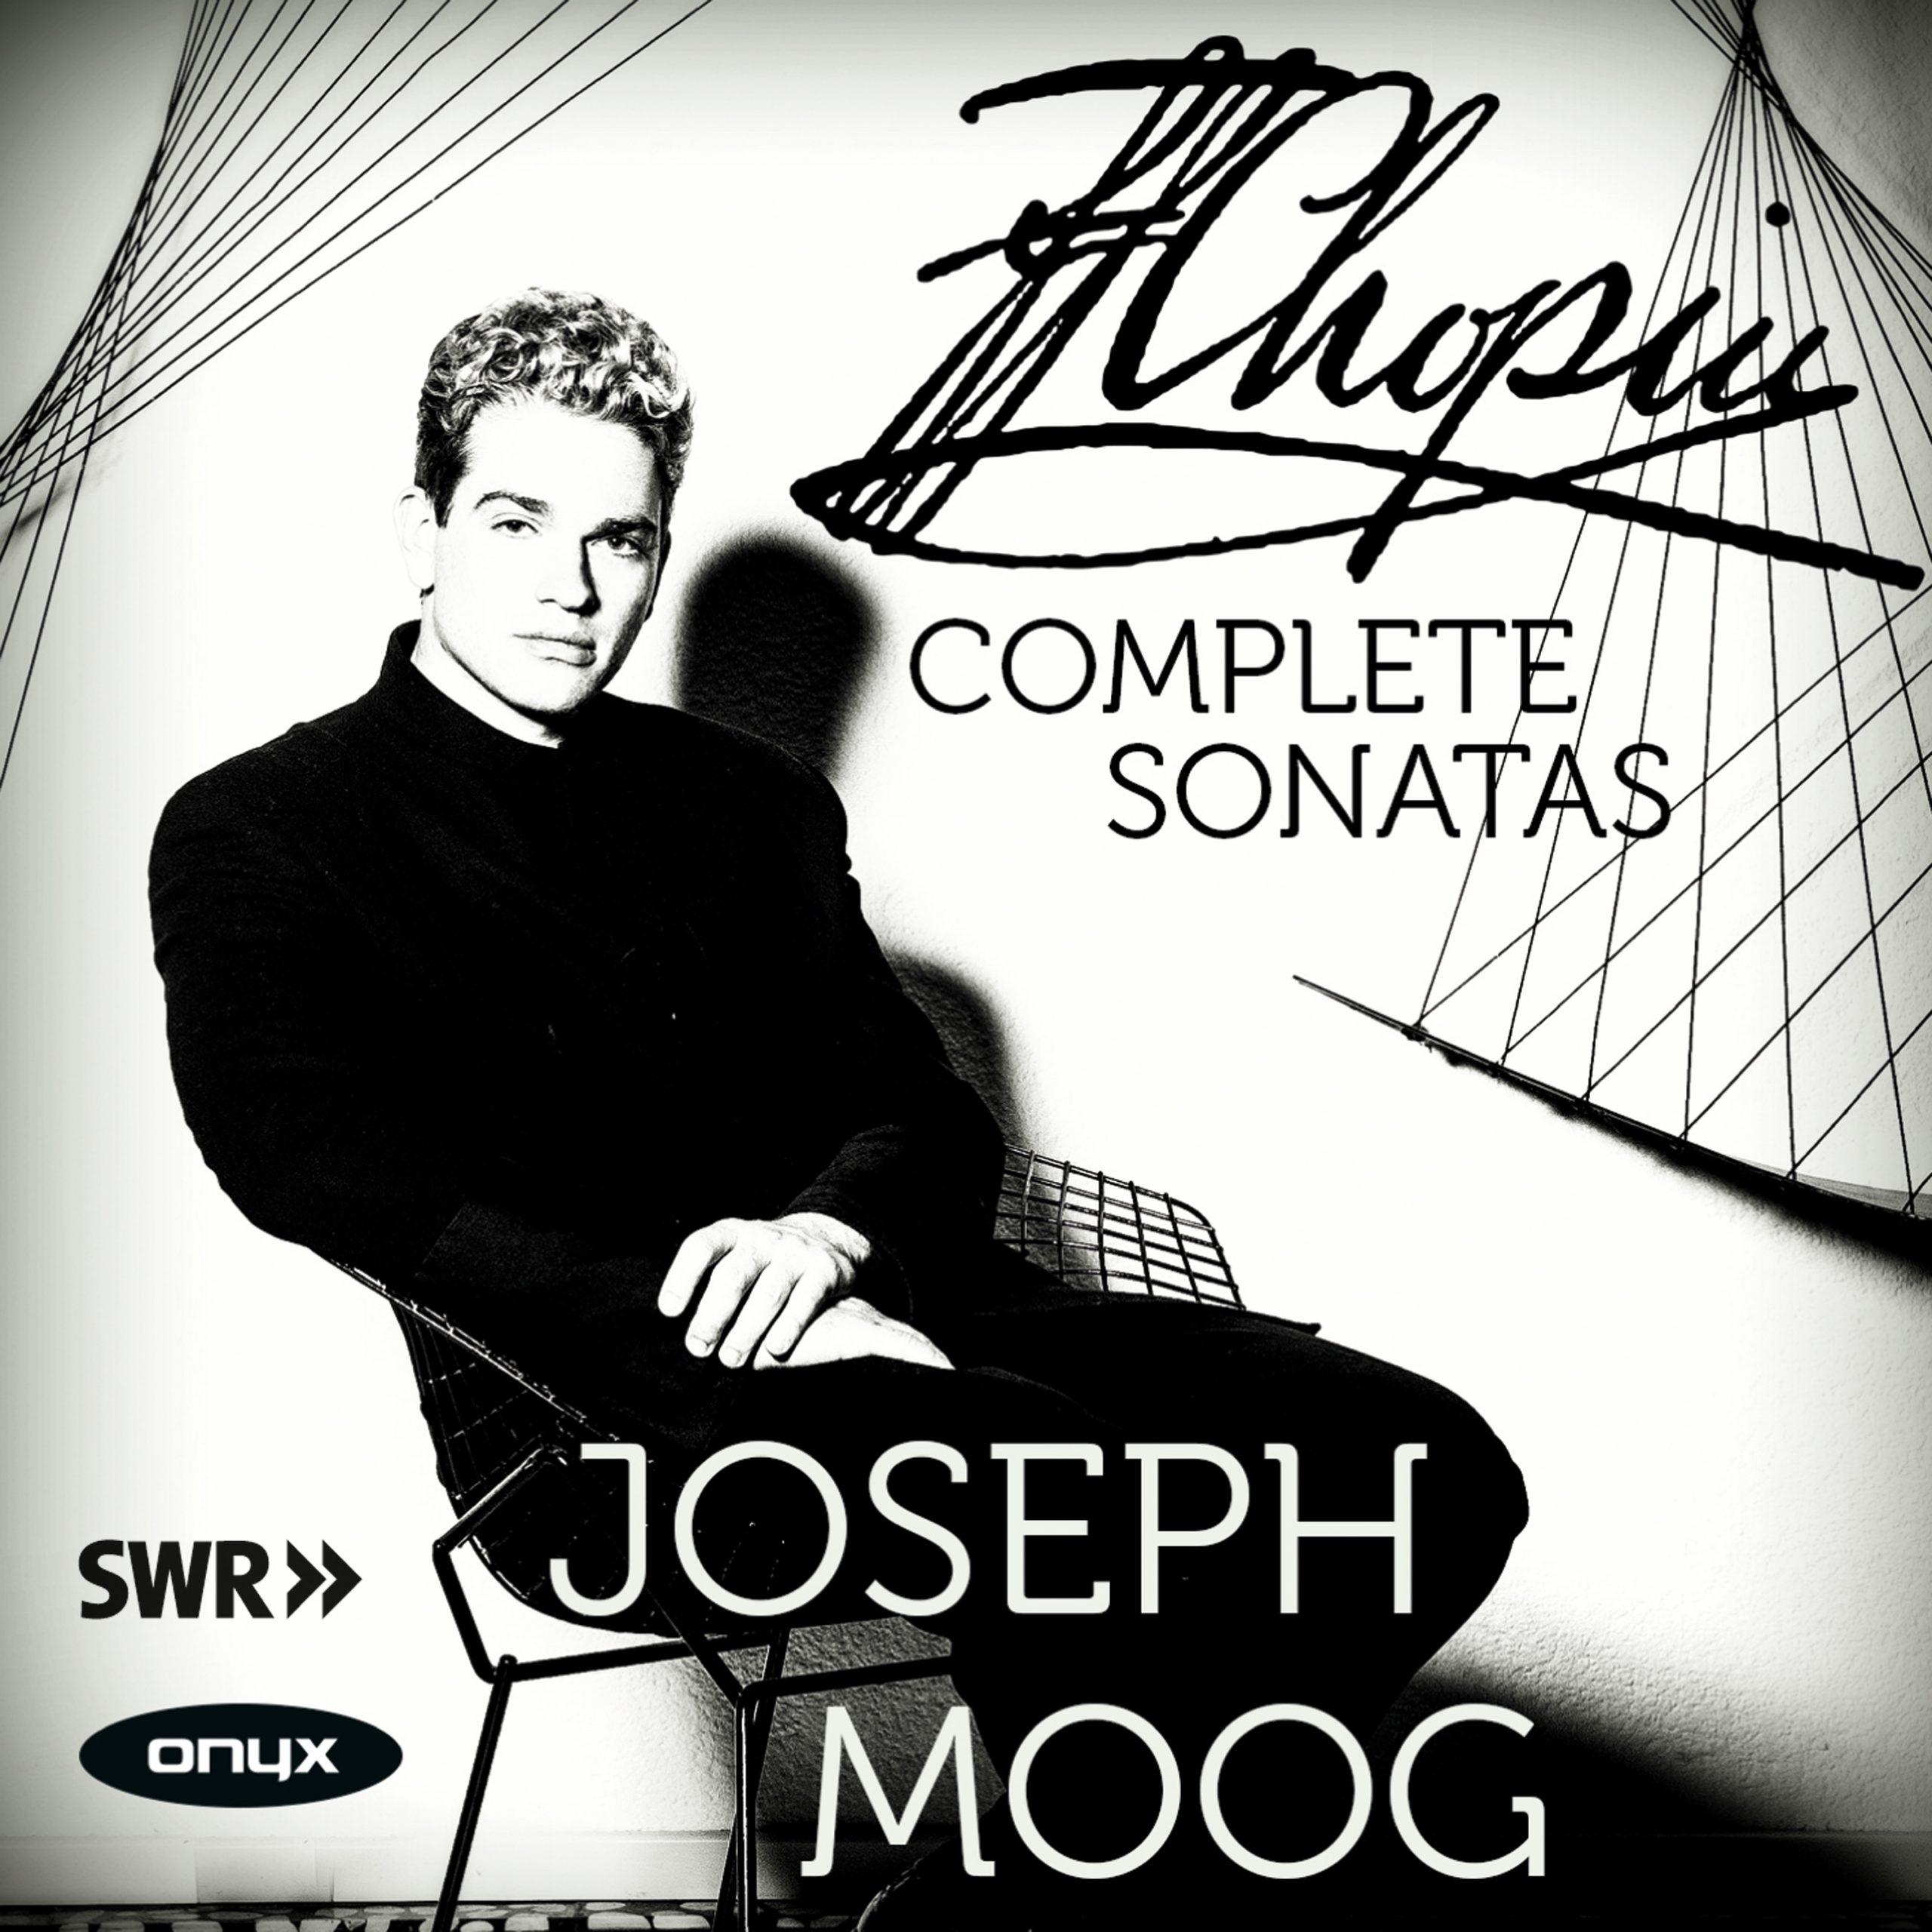 592Joseph Moog